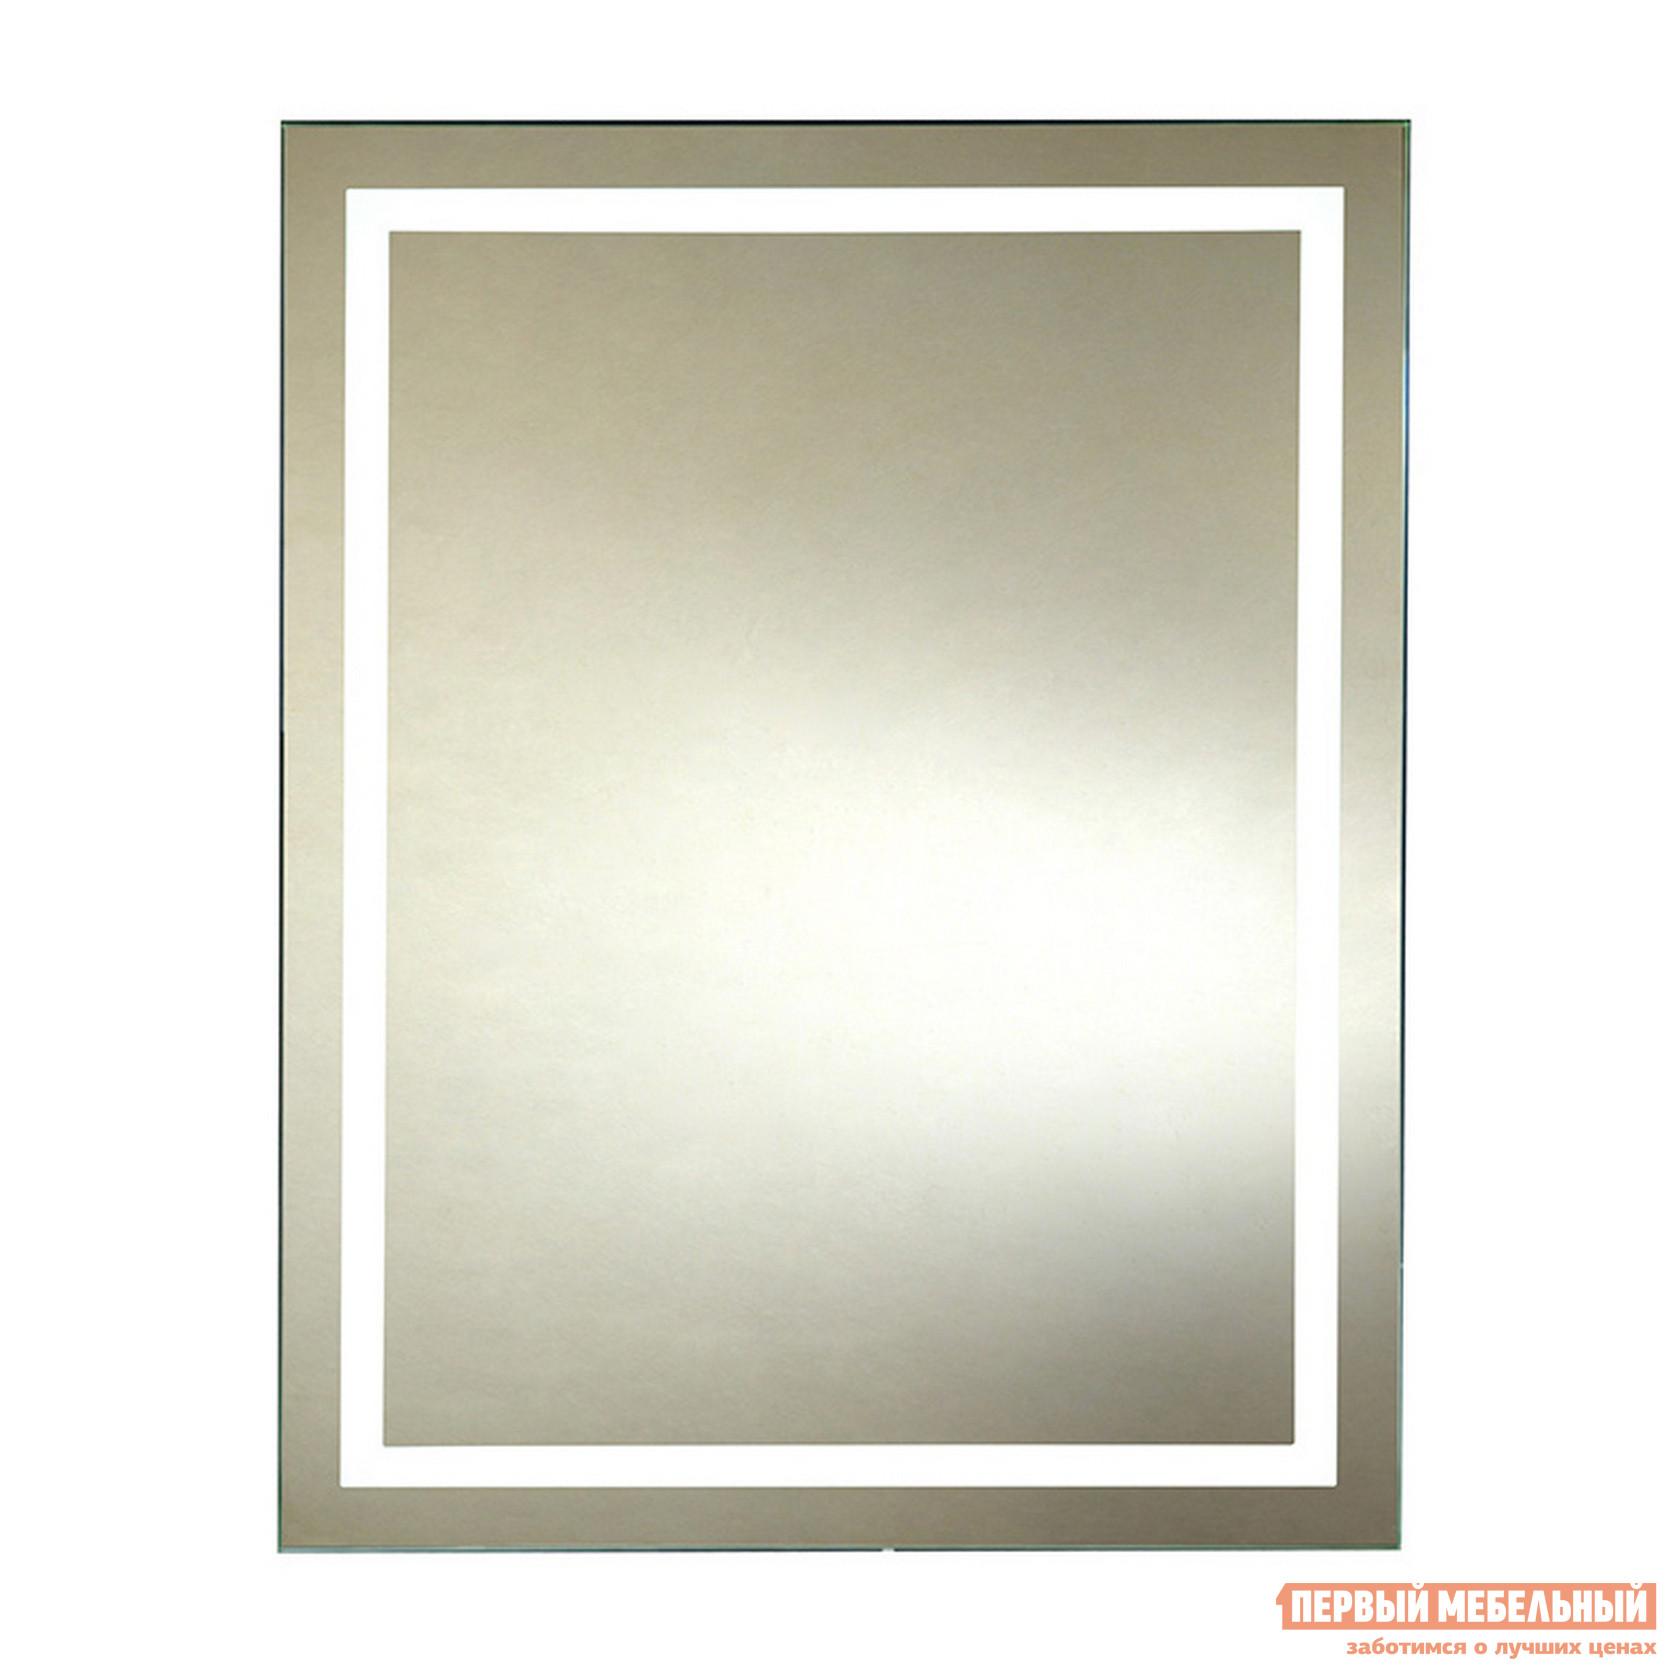 Настенное зеркало Континент Зеркало ЗЛП154